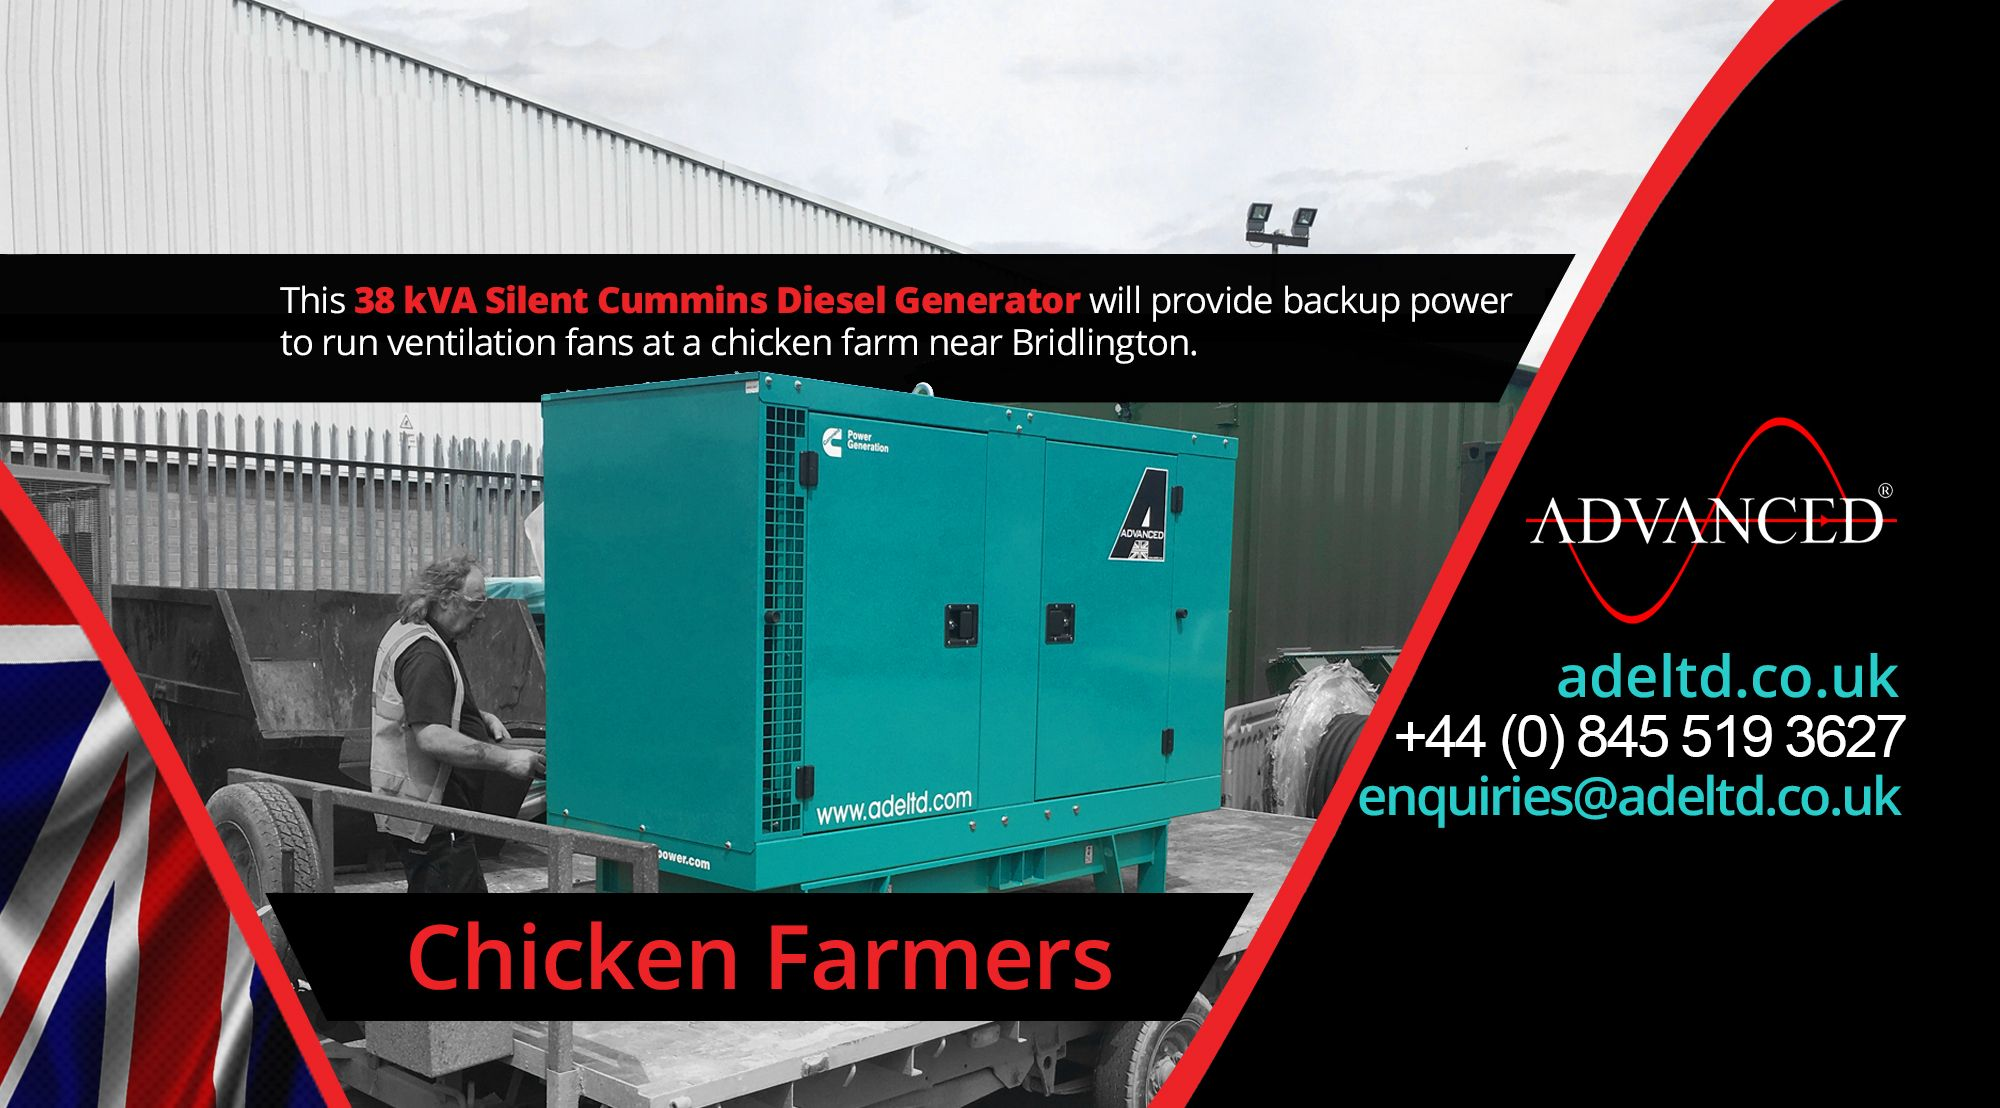 This 38 kVA silent Cummins Diesel Generator will provide backup